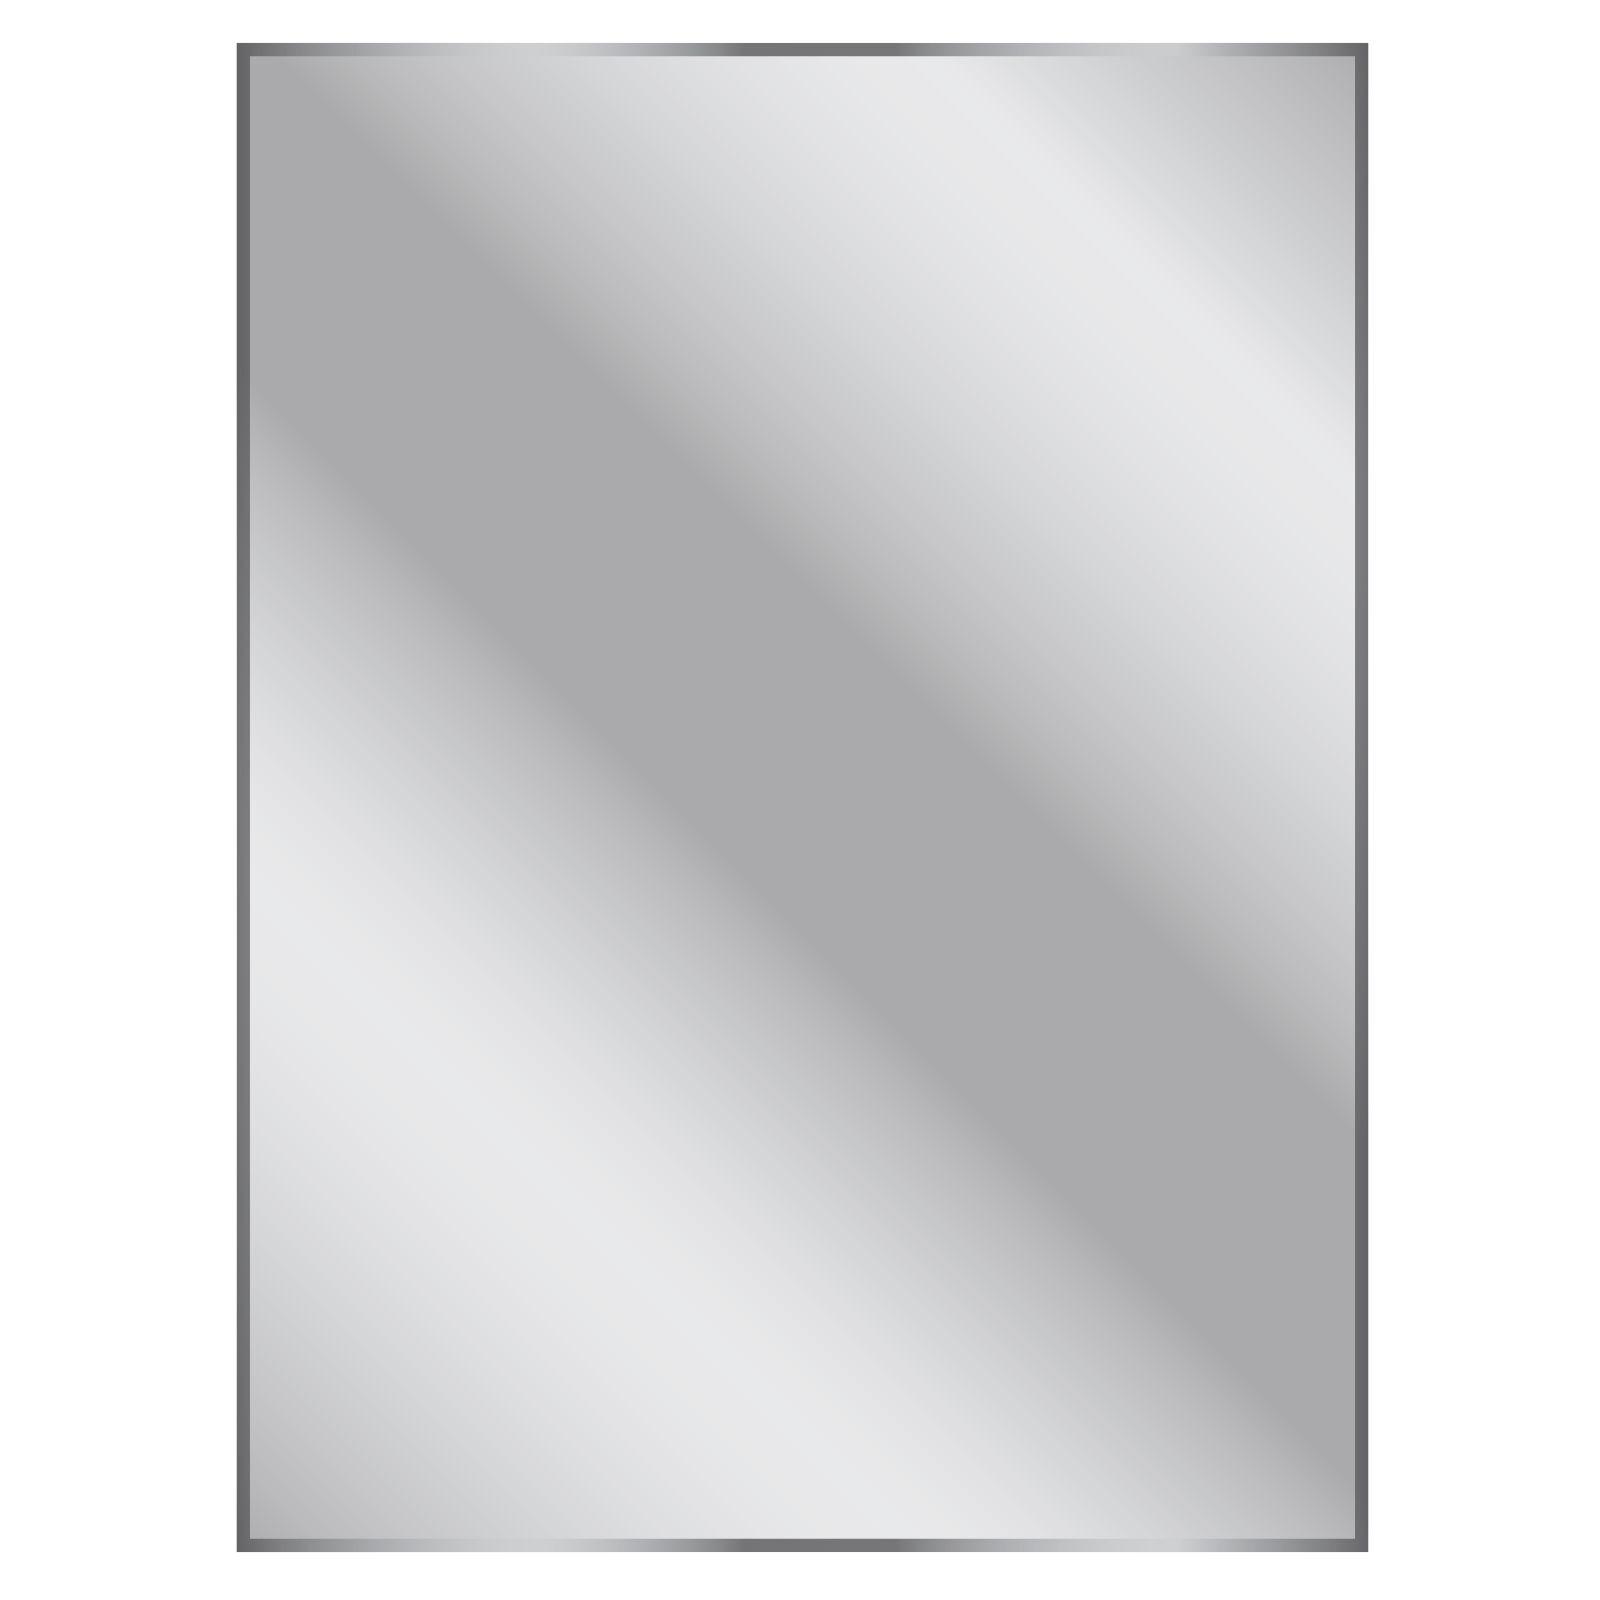 Living Elements 1200 x 900 x 5mm Bevel Edge Mirror